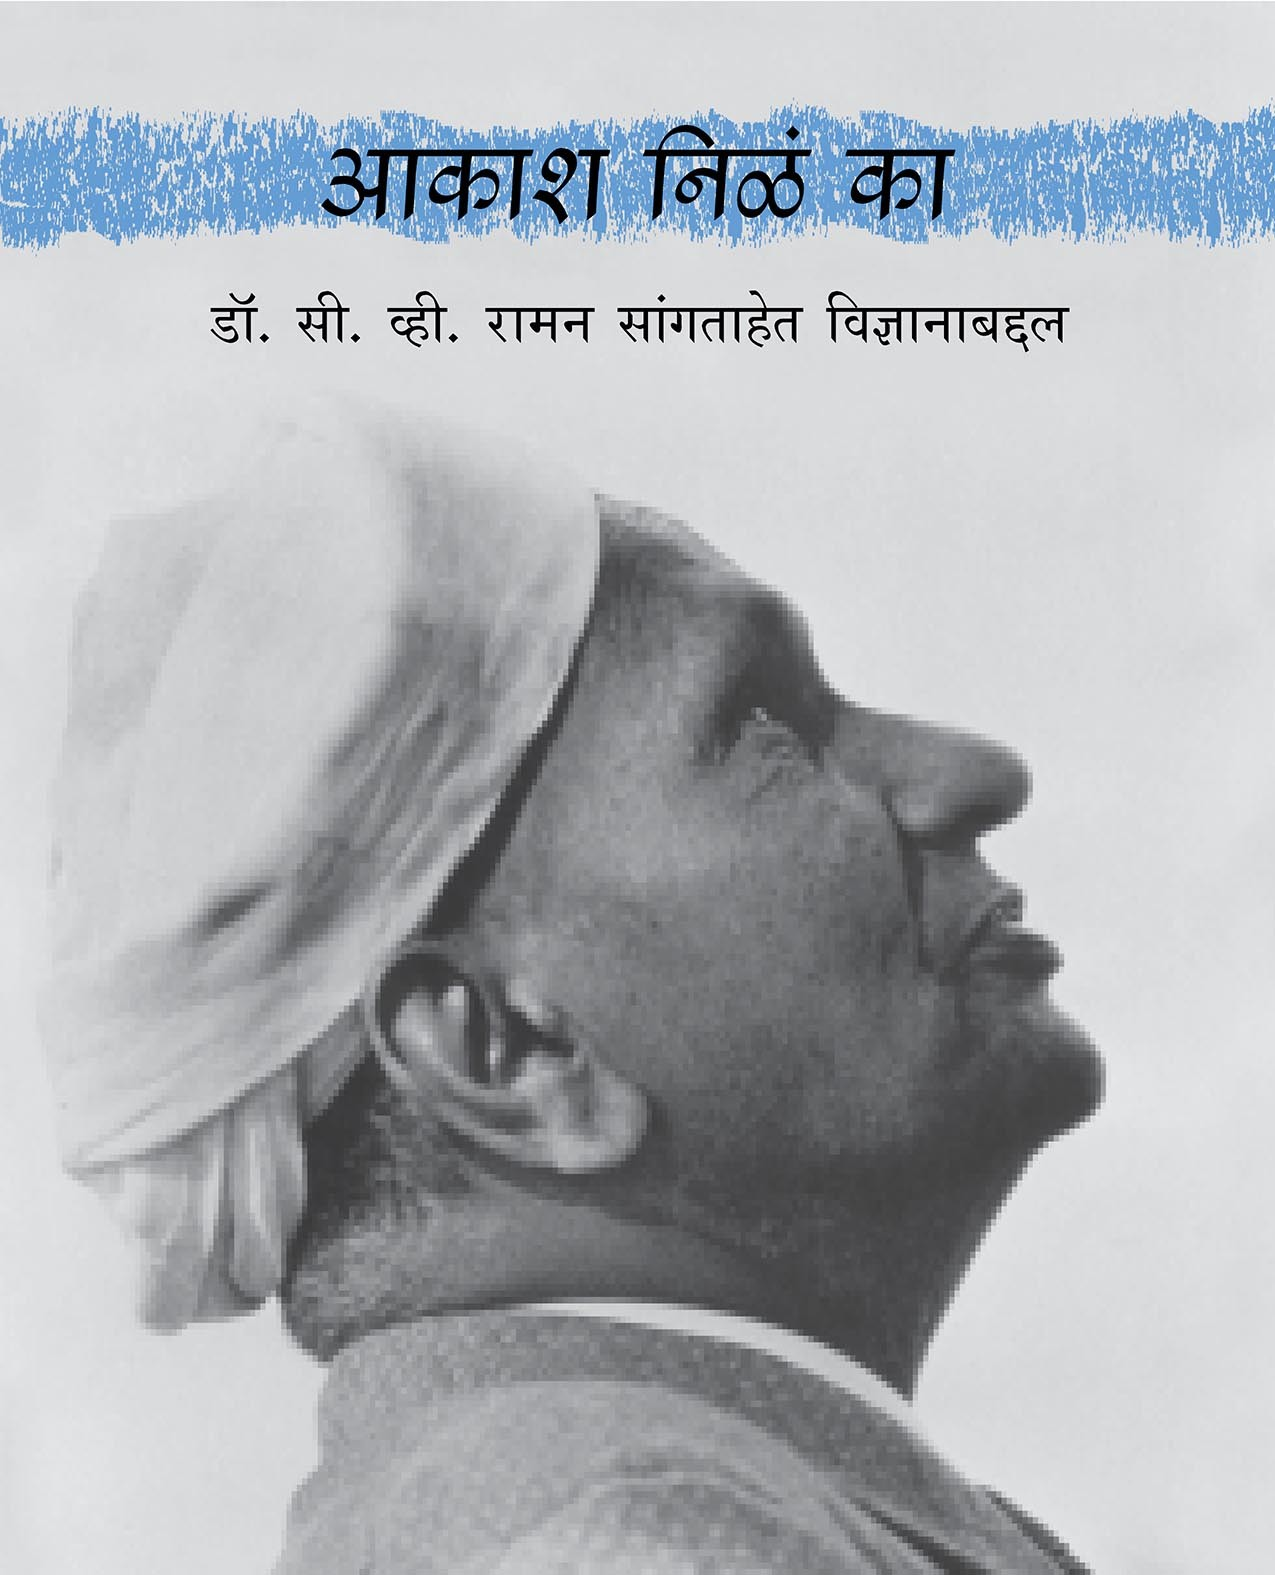 Why The Sky Is Blue/Aakaash Nila Kaa (Marathi)